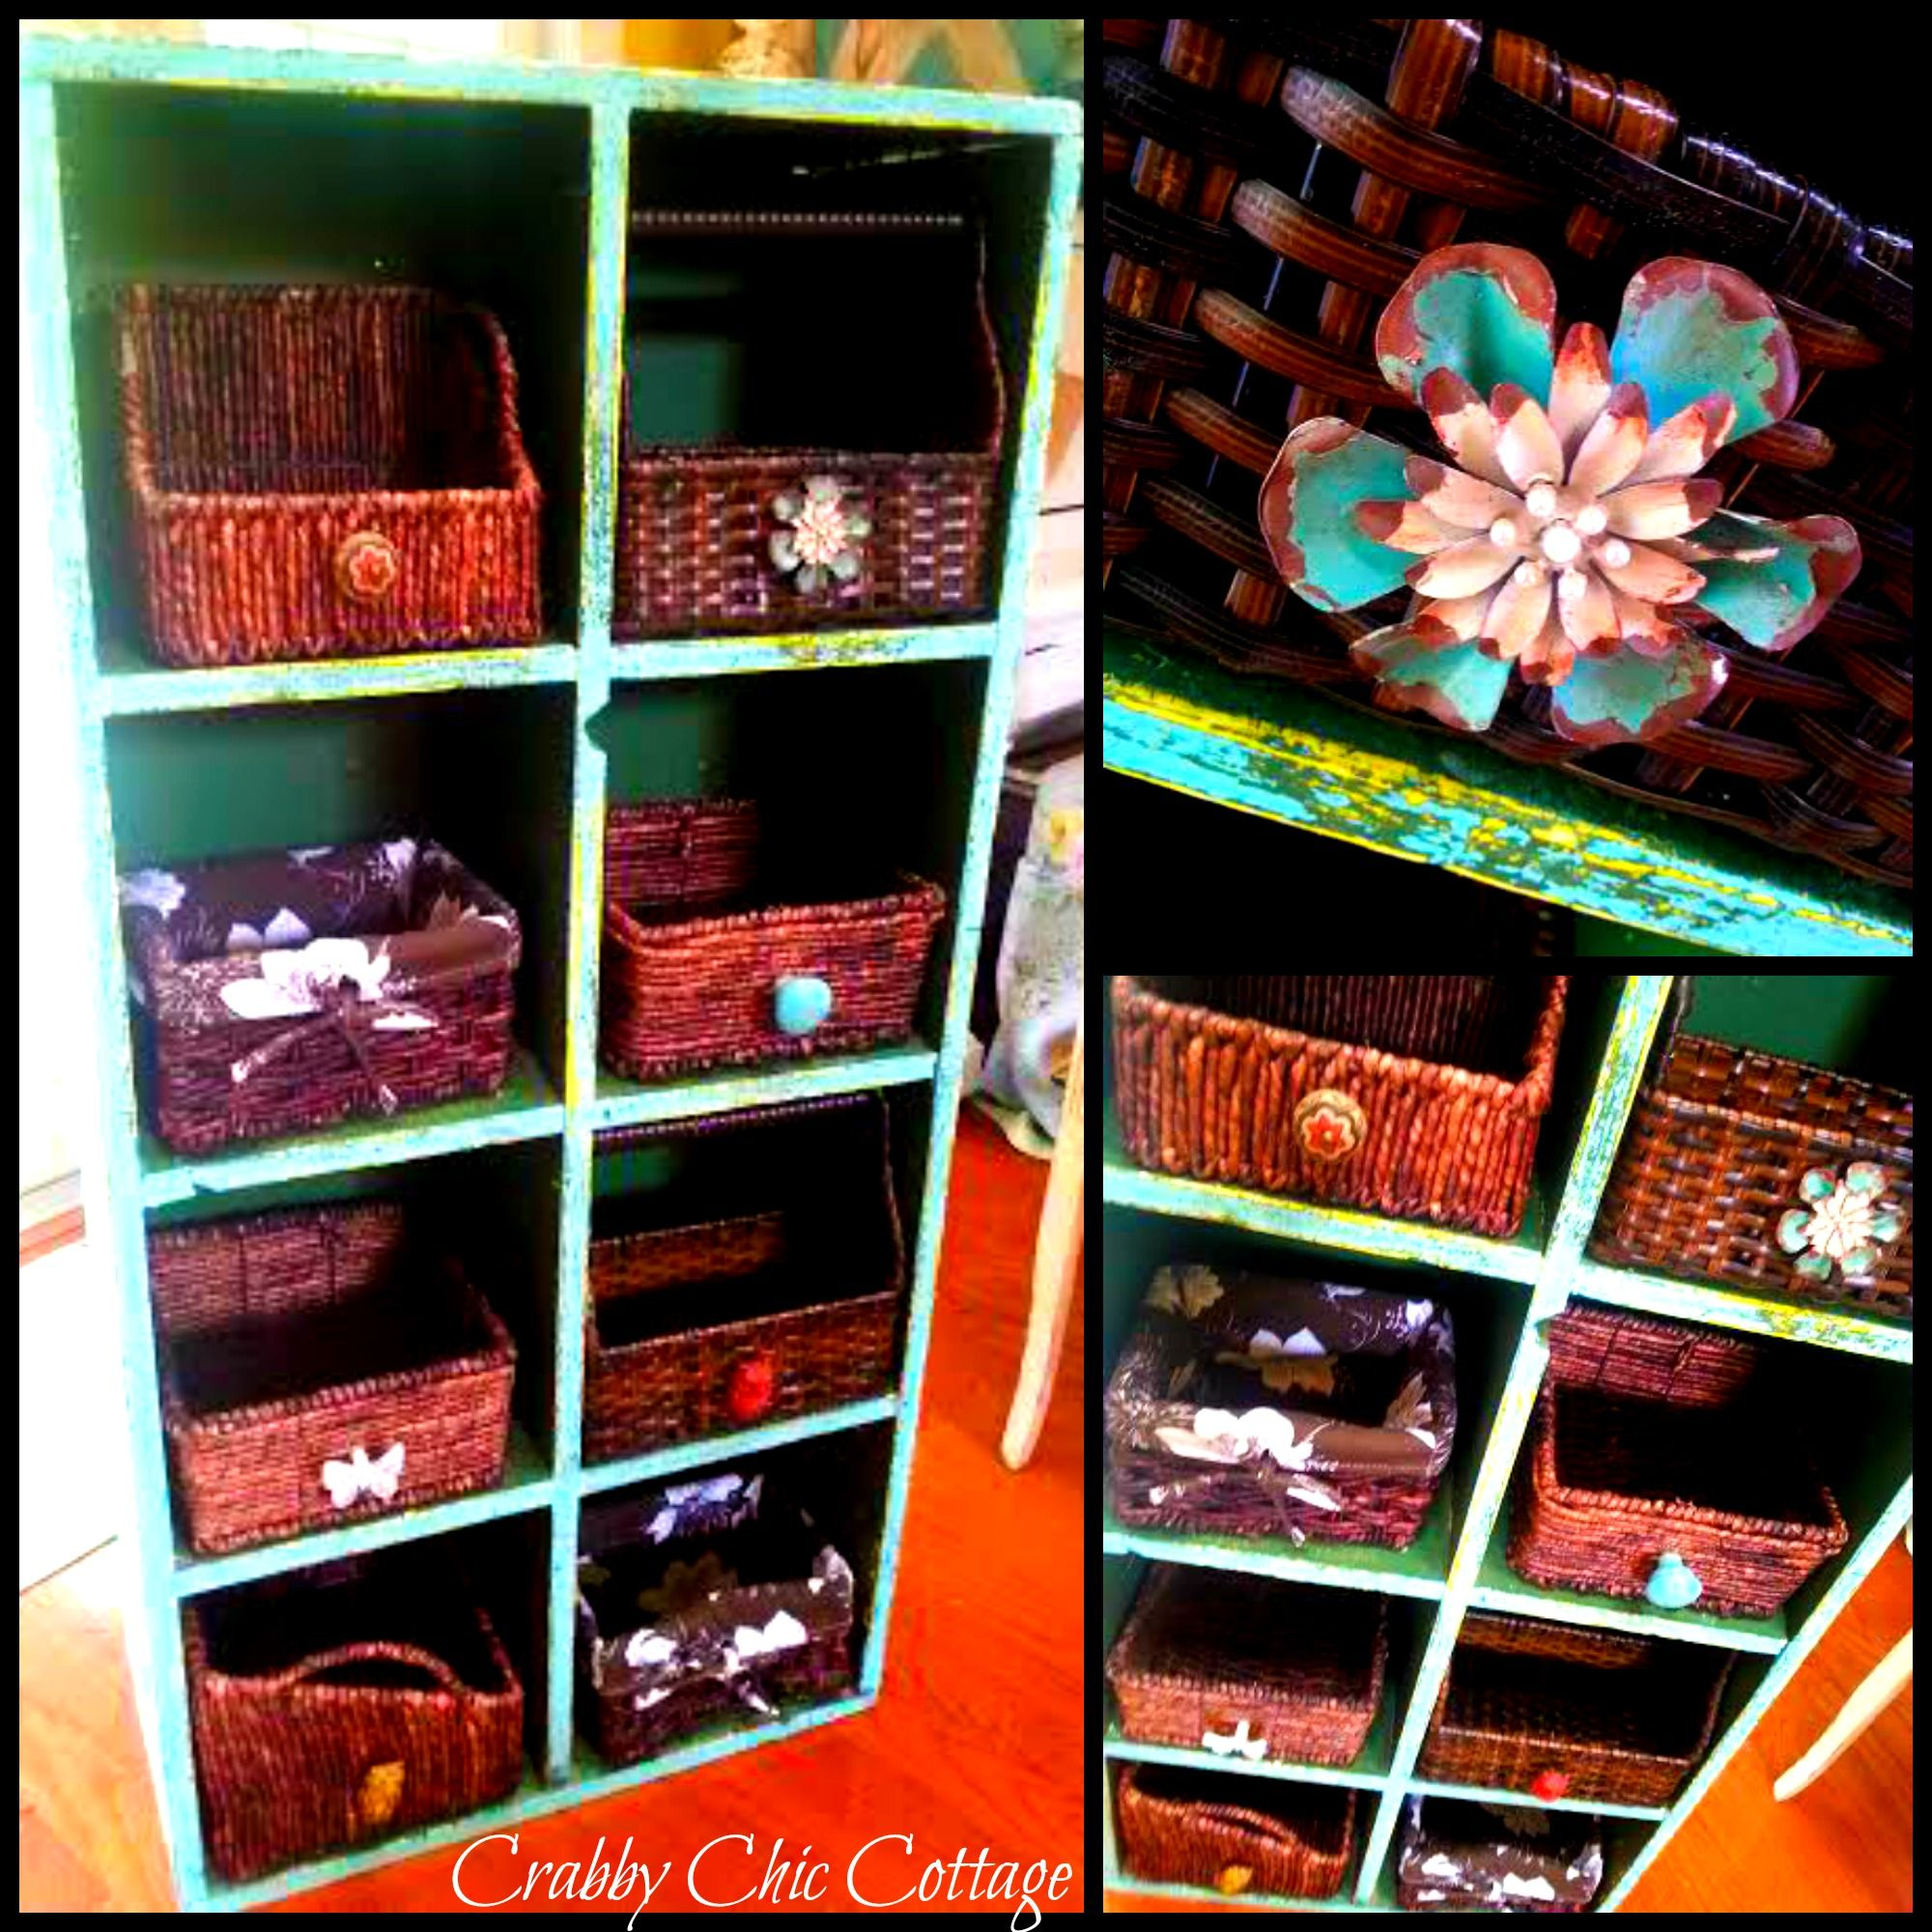 Boho Chic Cubby Shelf With Baskets Basket Shelves Cubby Shelves Cubbies